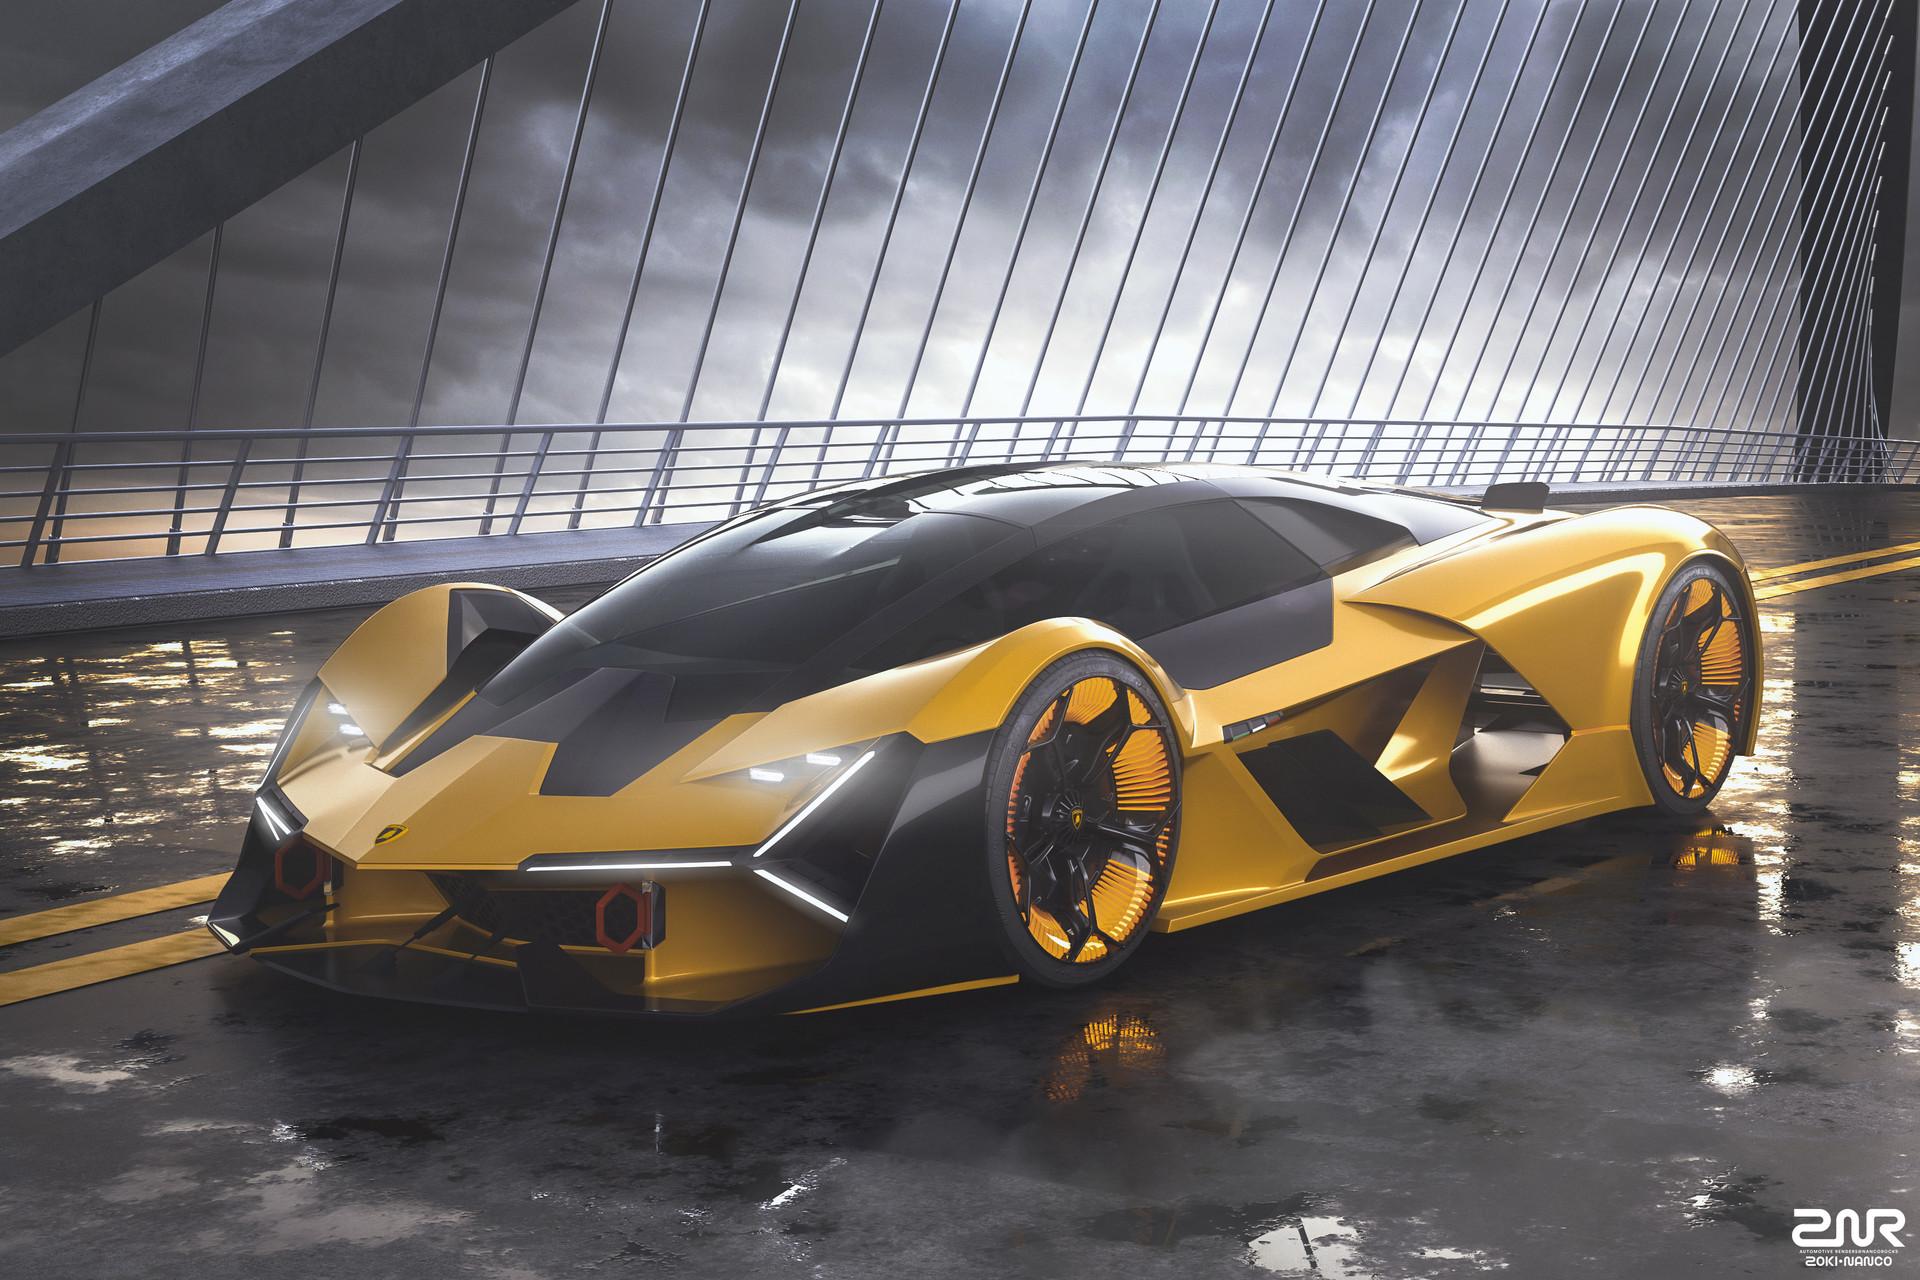 Zoki Nanco Nancorocks Znr3d Lamborghini Terzo Millennio